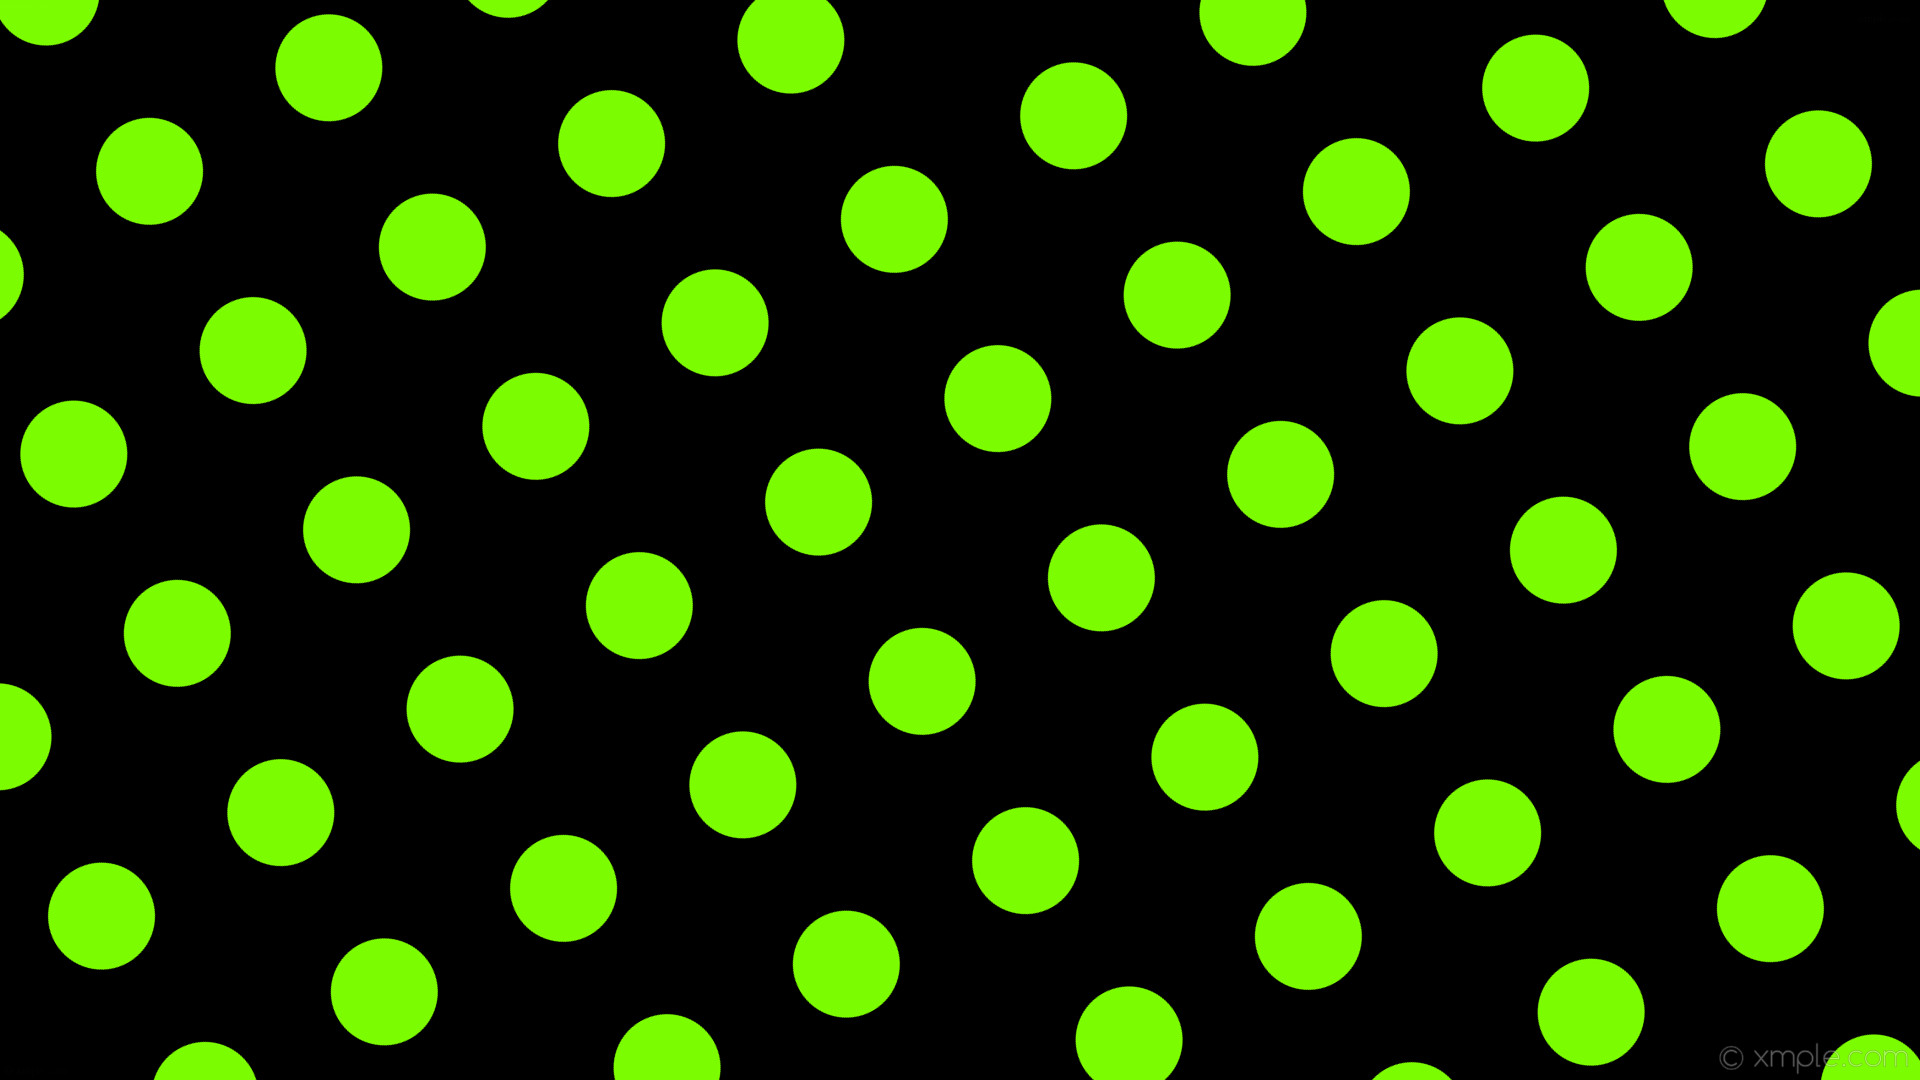 wallpaper spots black green polka dots lawn green #000000 #7cfc00 30° 107px  207px